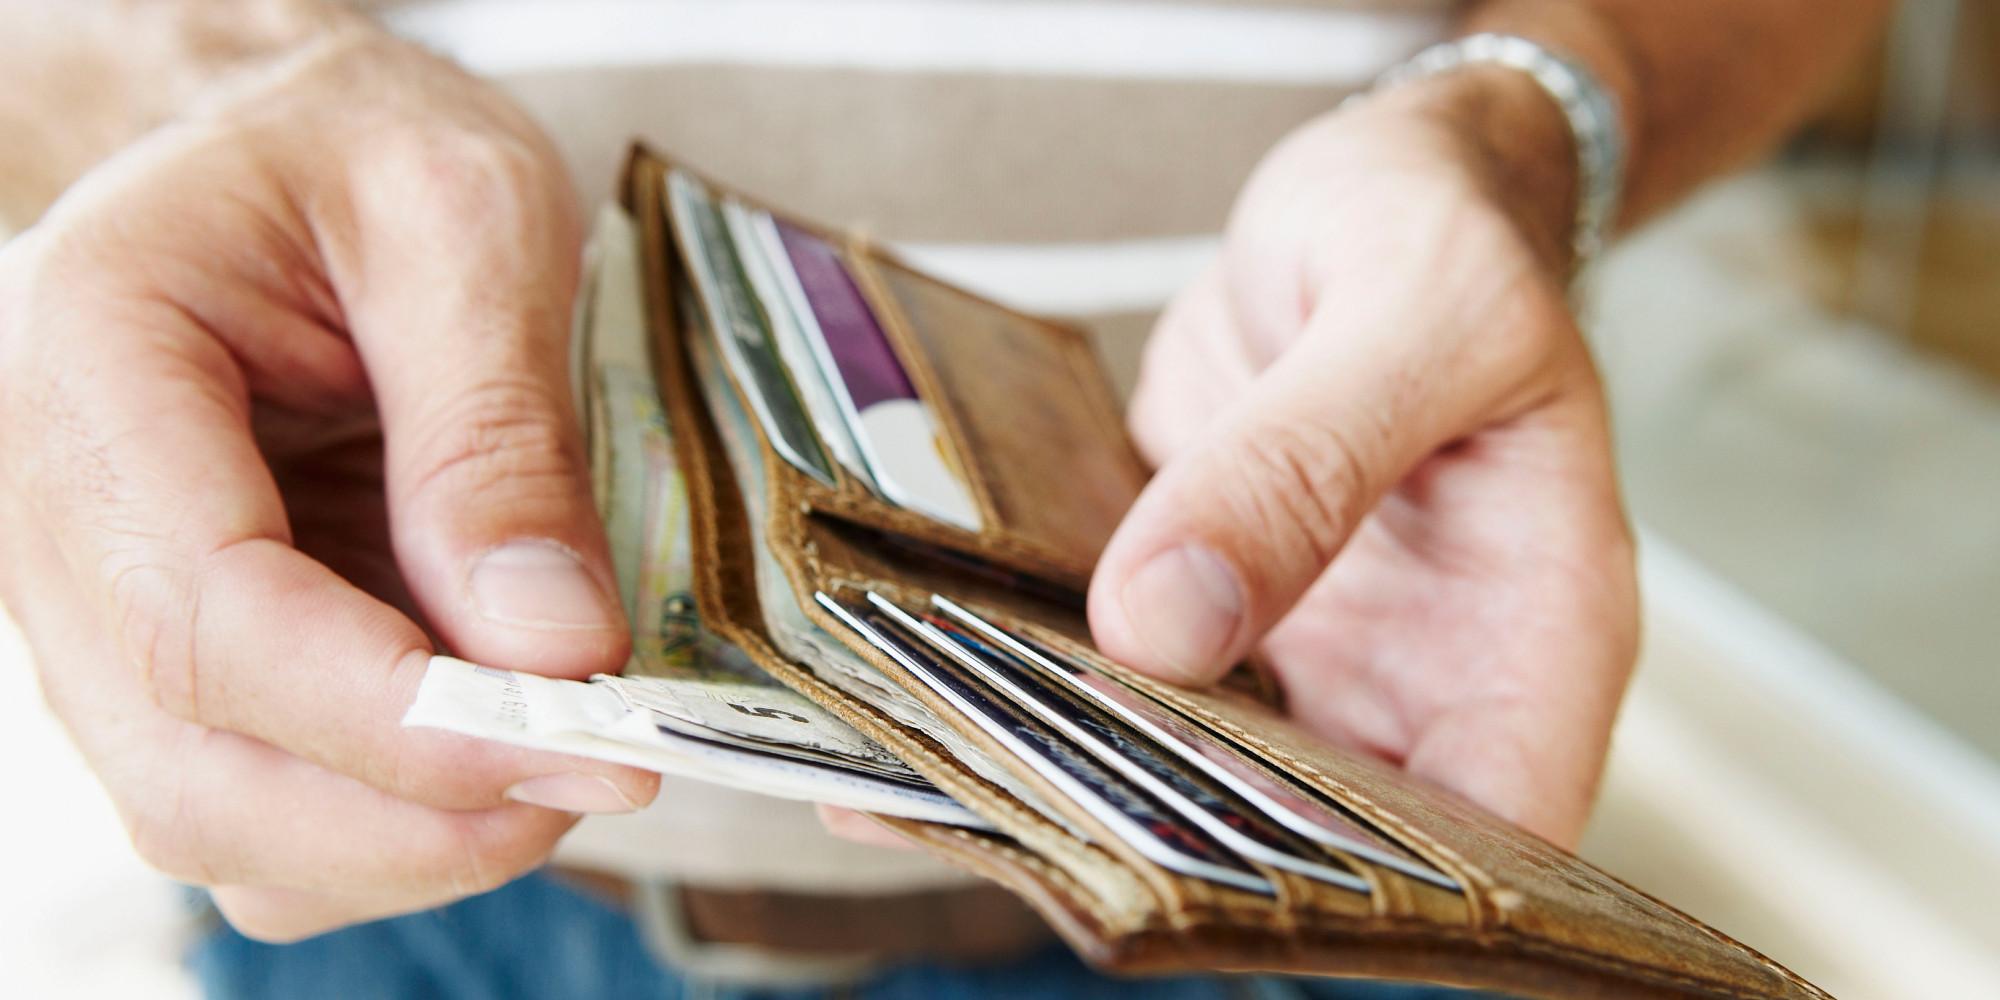 B0FR95 Man removes cash from wallet